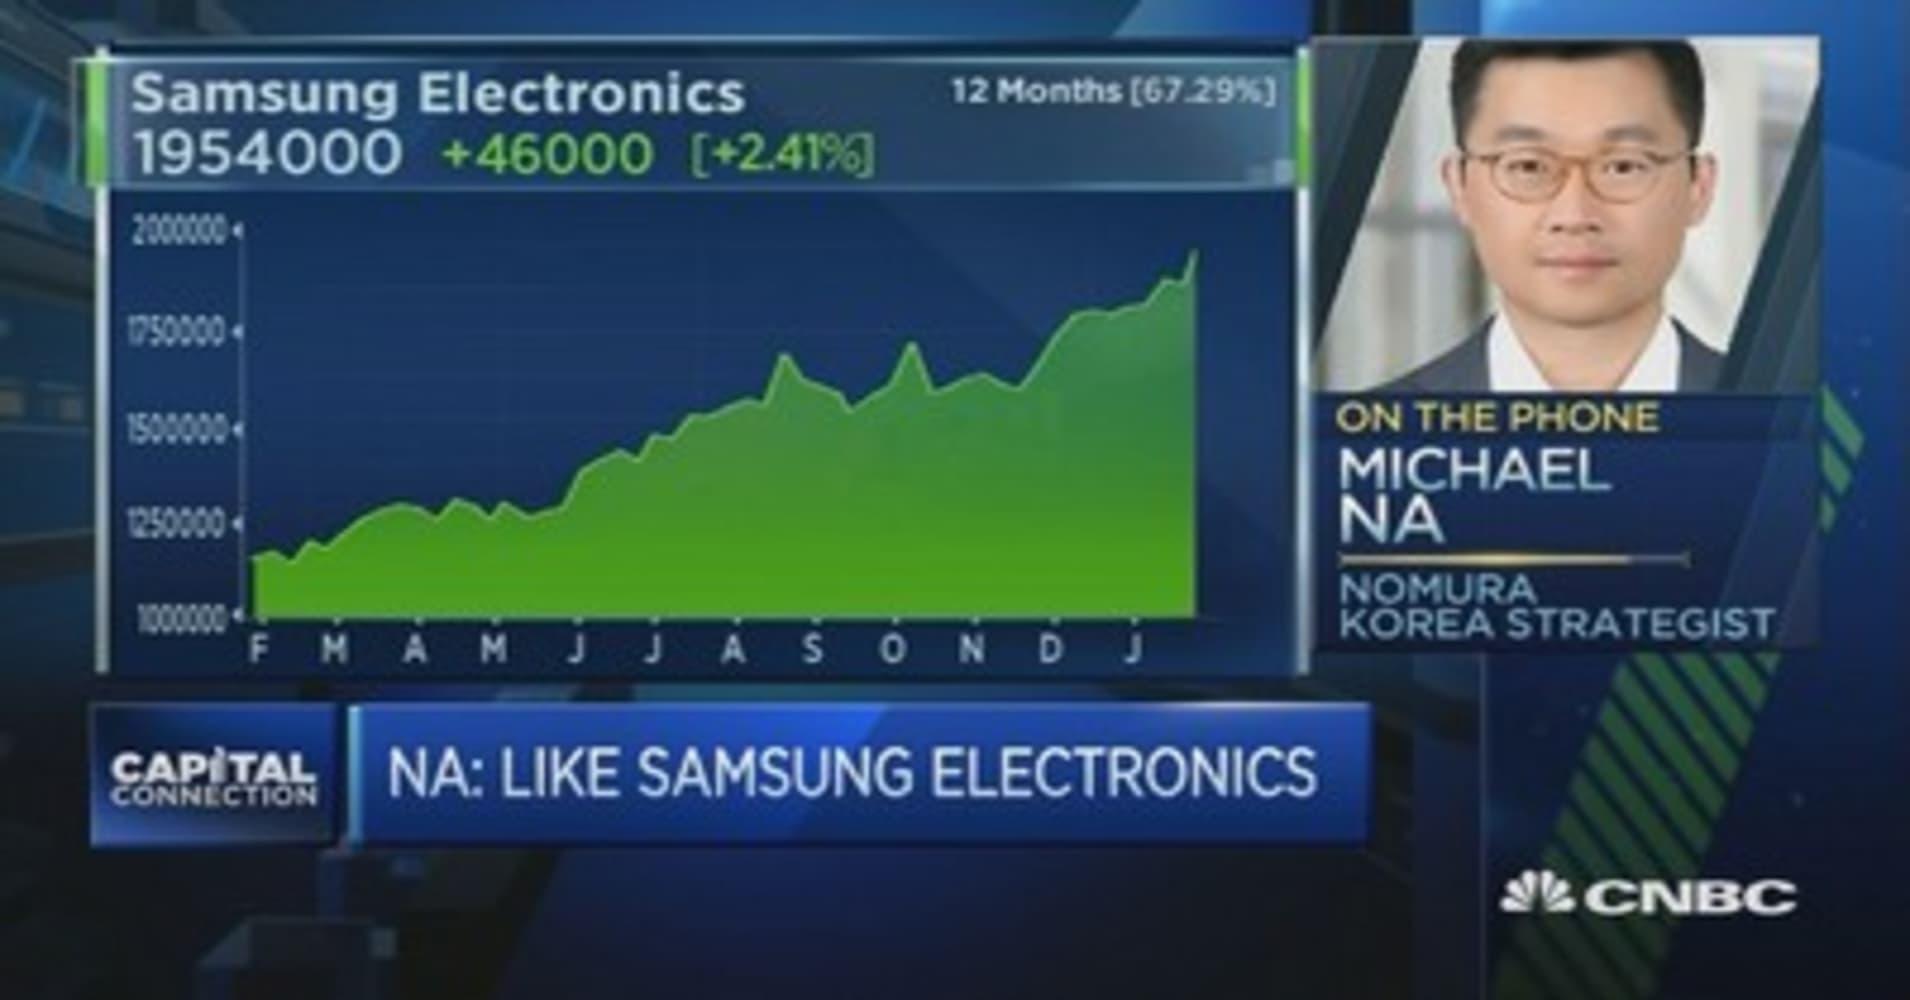 Samsung stocks can run higher: Strategist